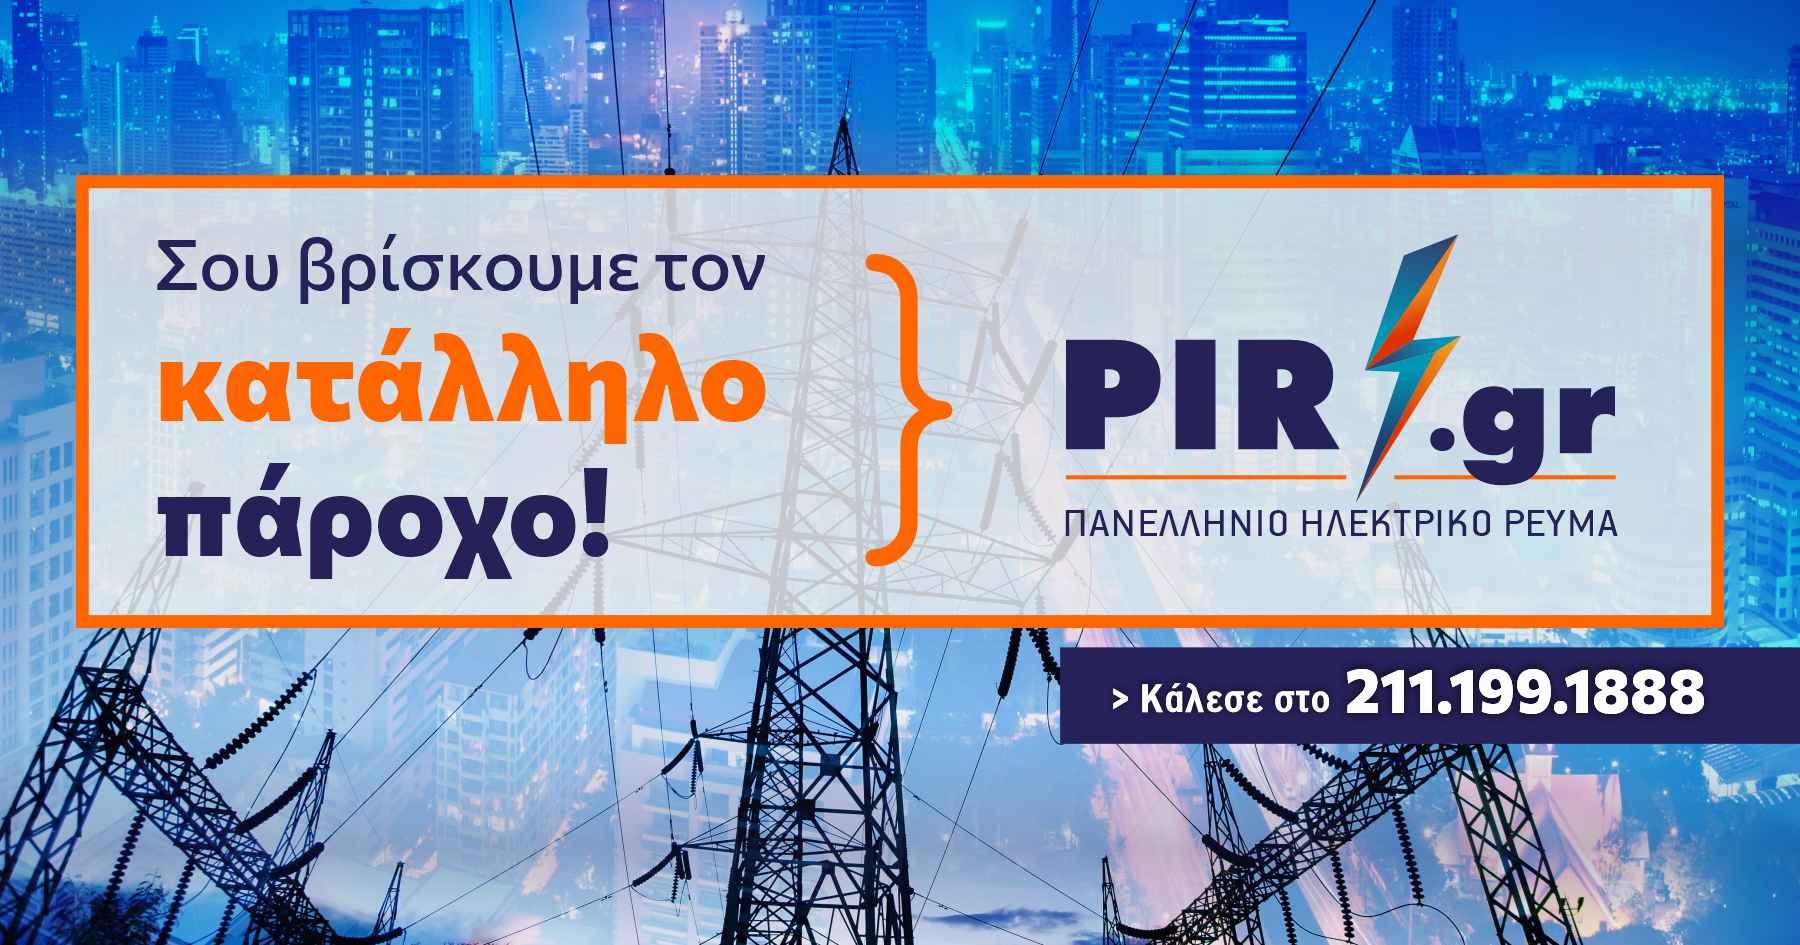 pir.gr